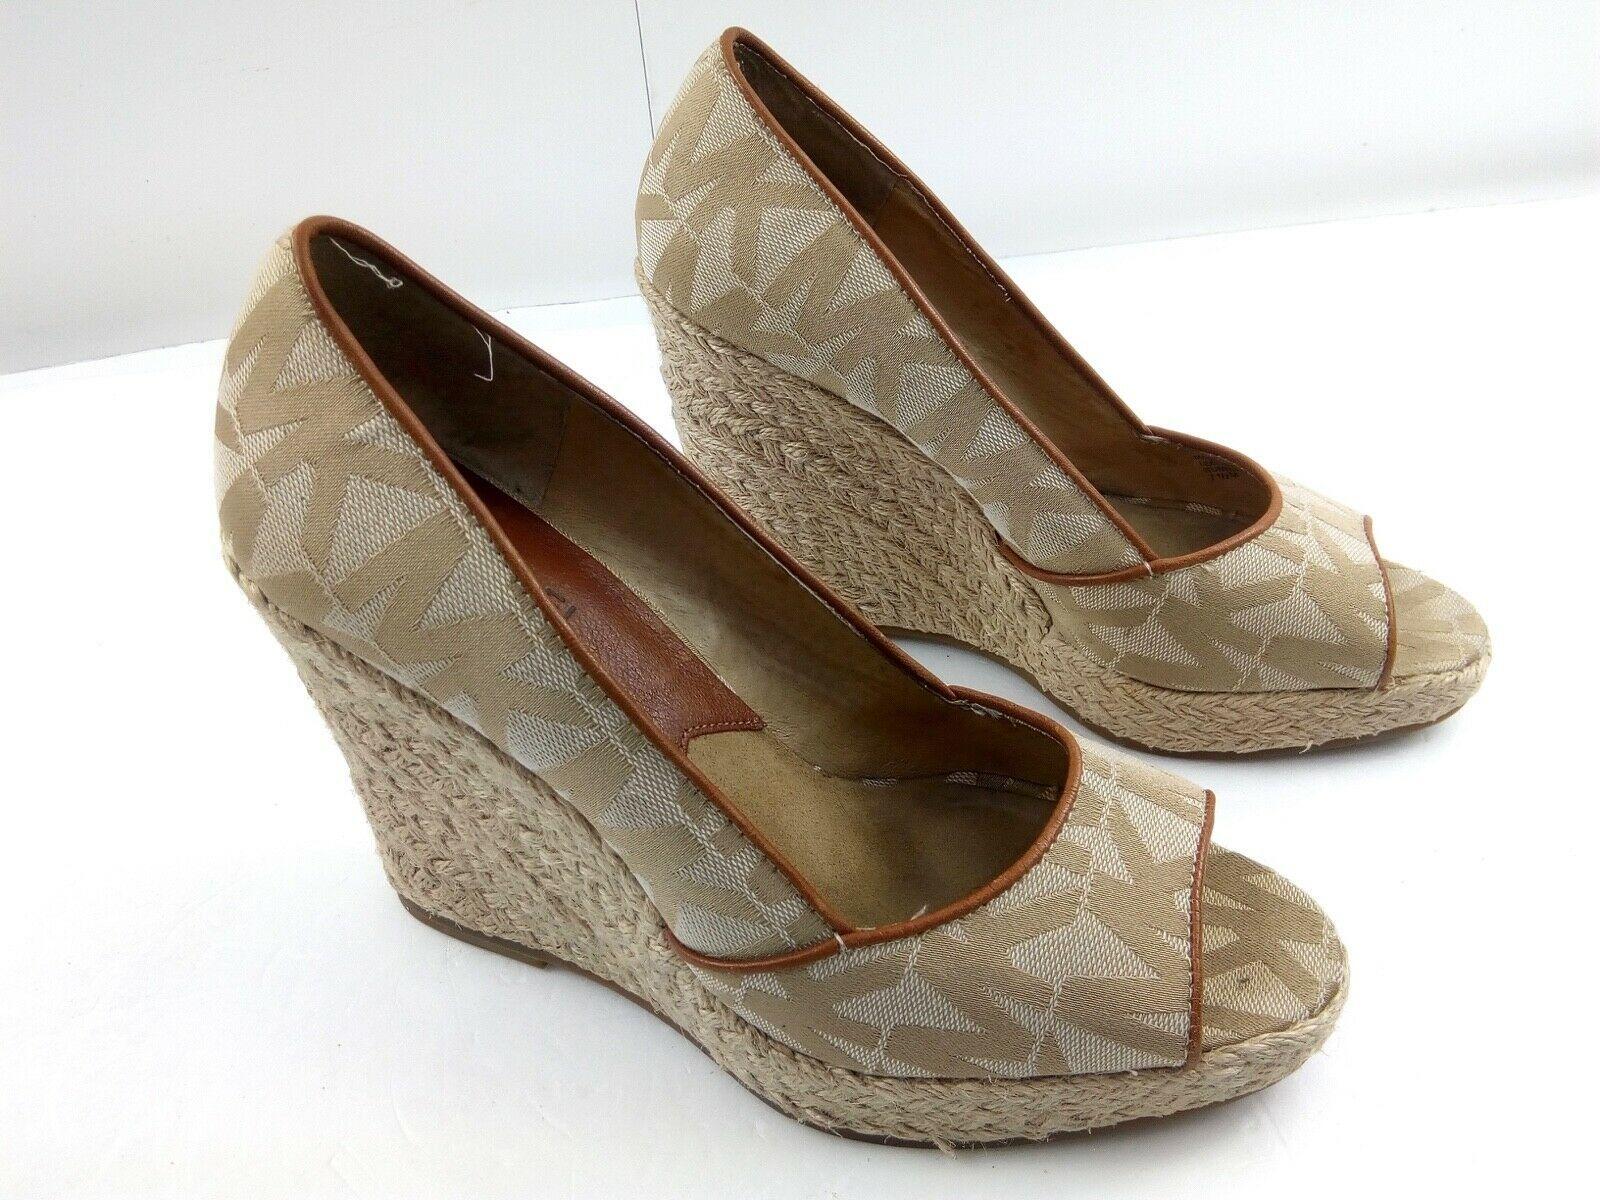 MICHAEL KORS Womens Wedges 7.5 Tan Cabana Peep Toe Platform Espadrilles $144 image 2